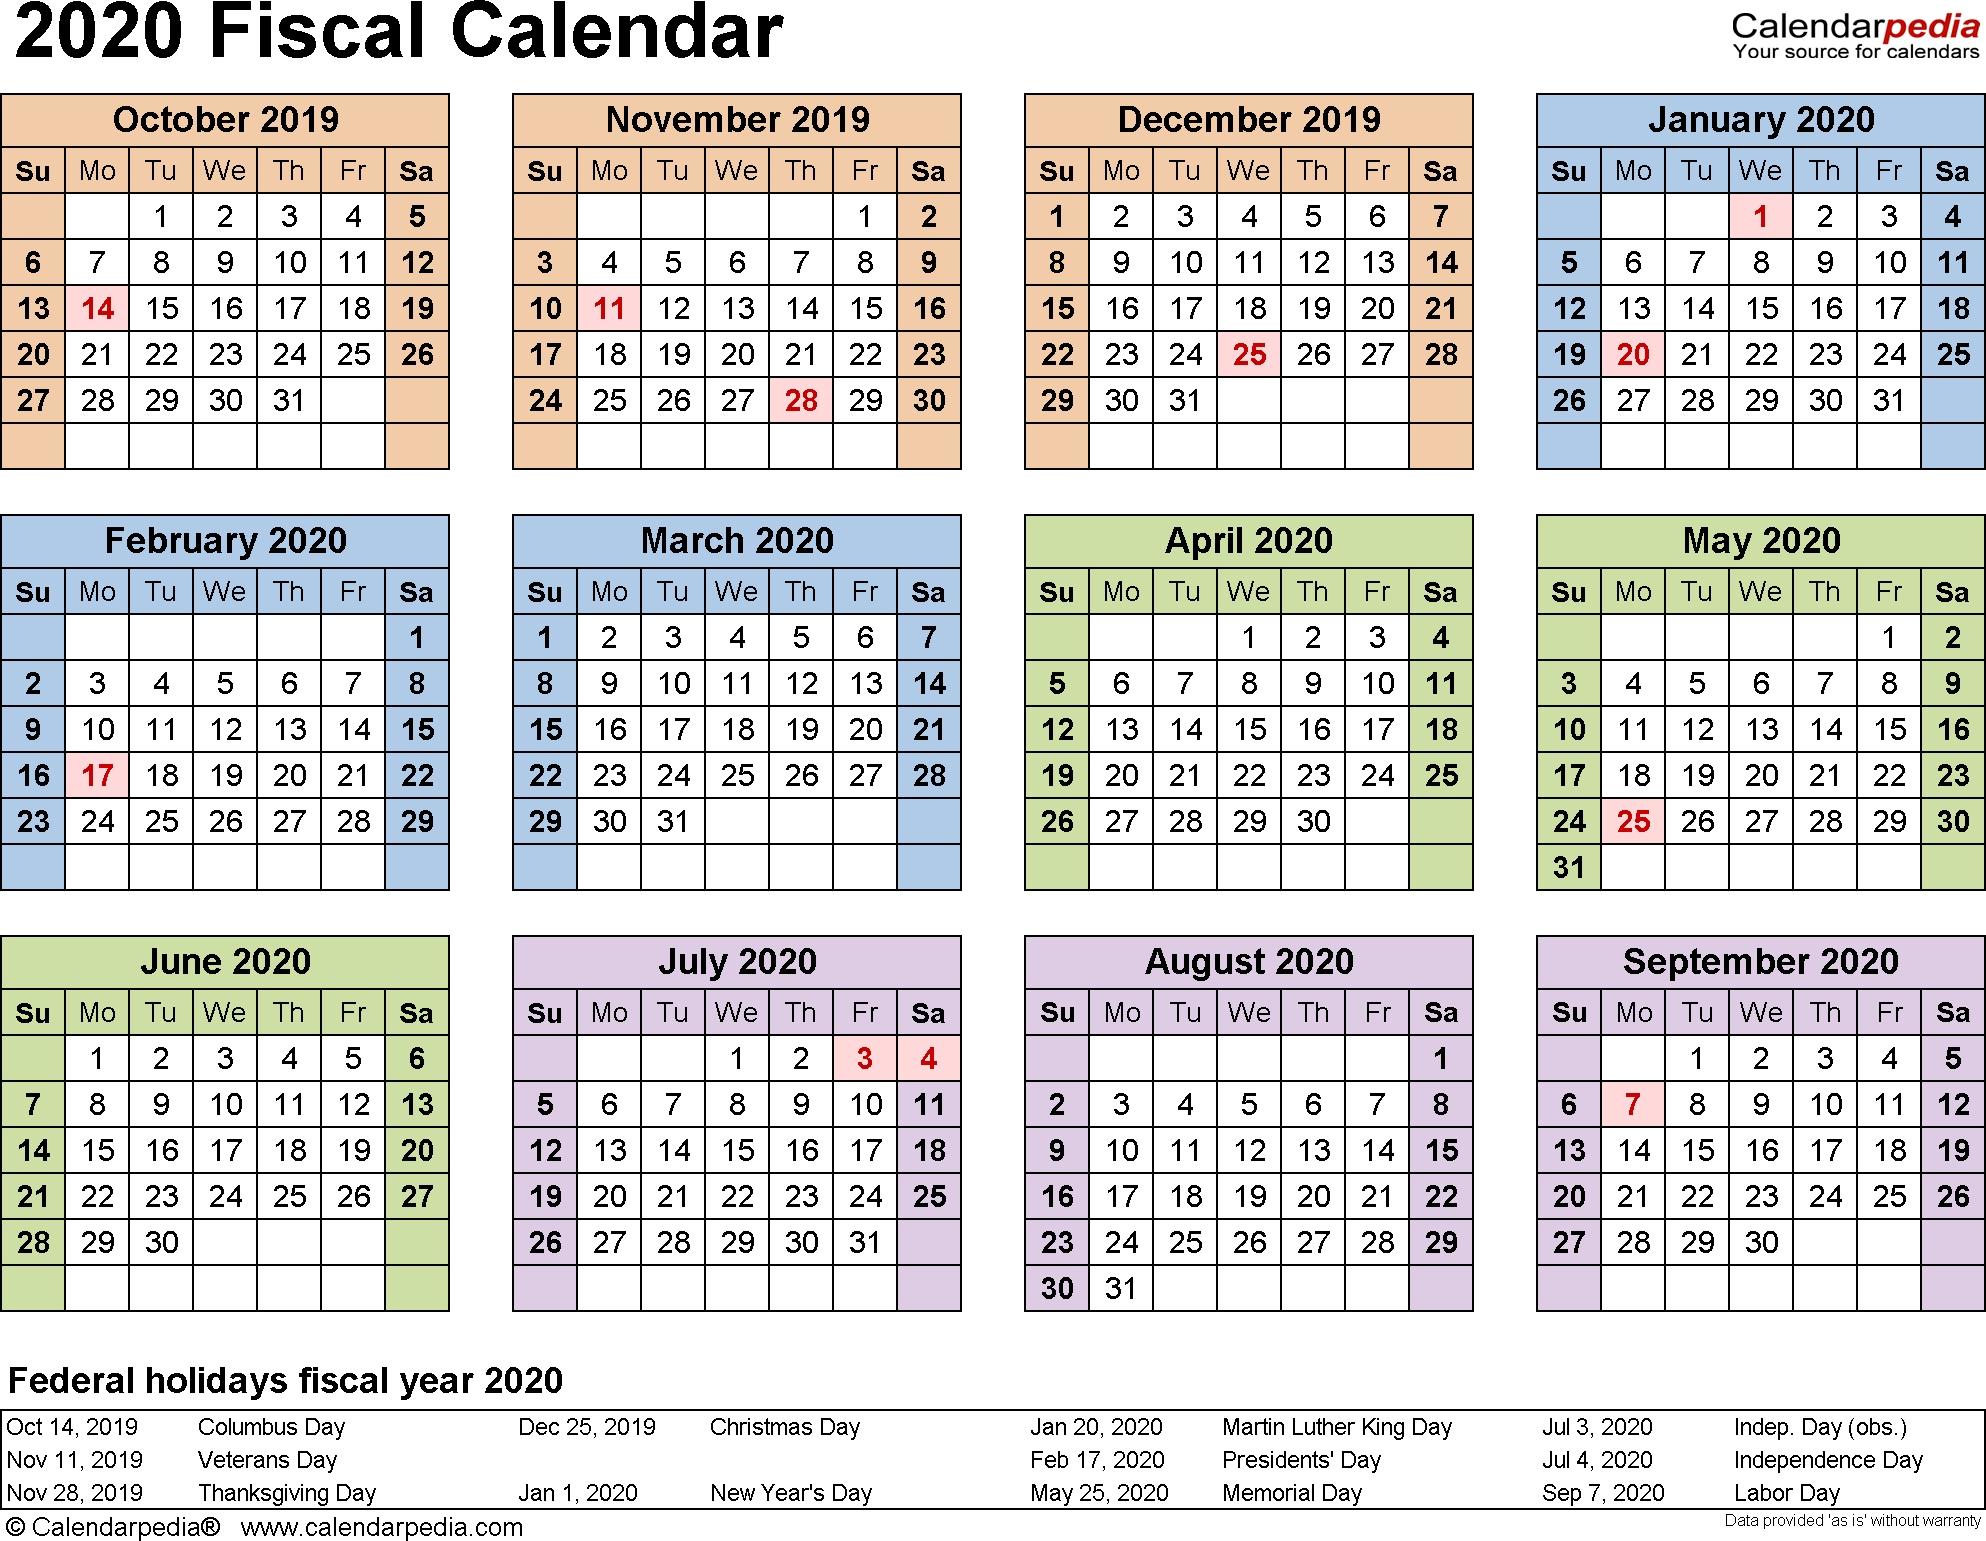 Fiscal Calendars 2020 As Free Printable Pdf Templates  Australian Financial Year 2020 Dates